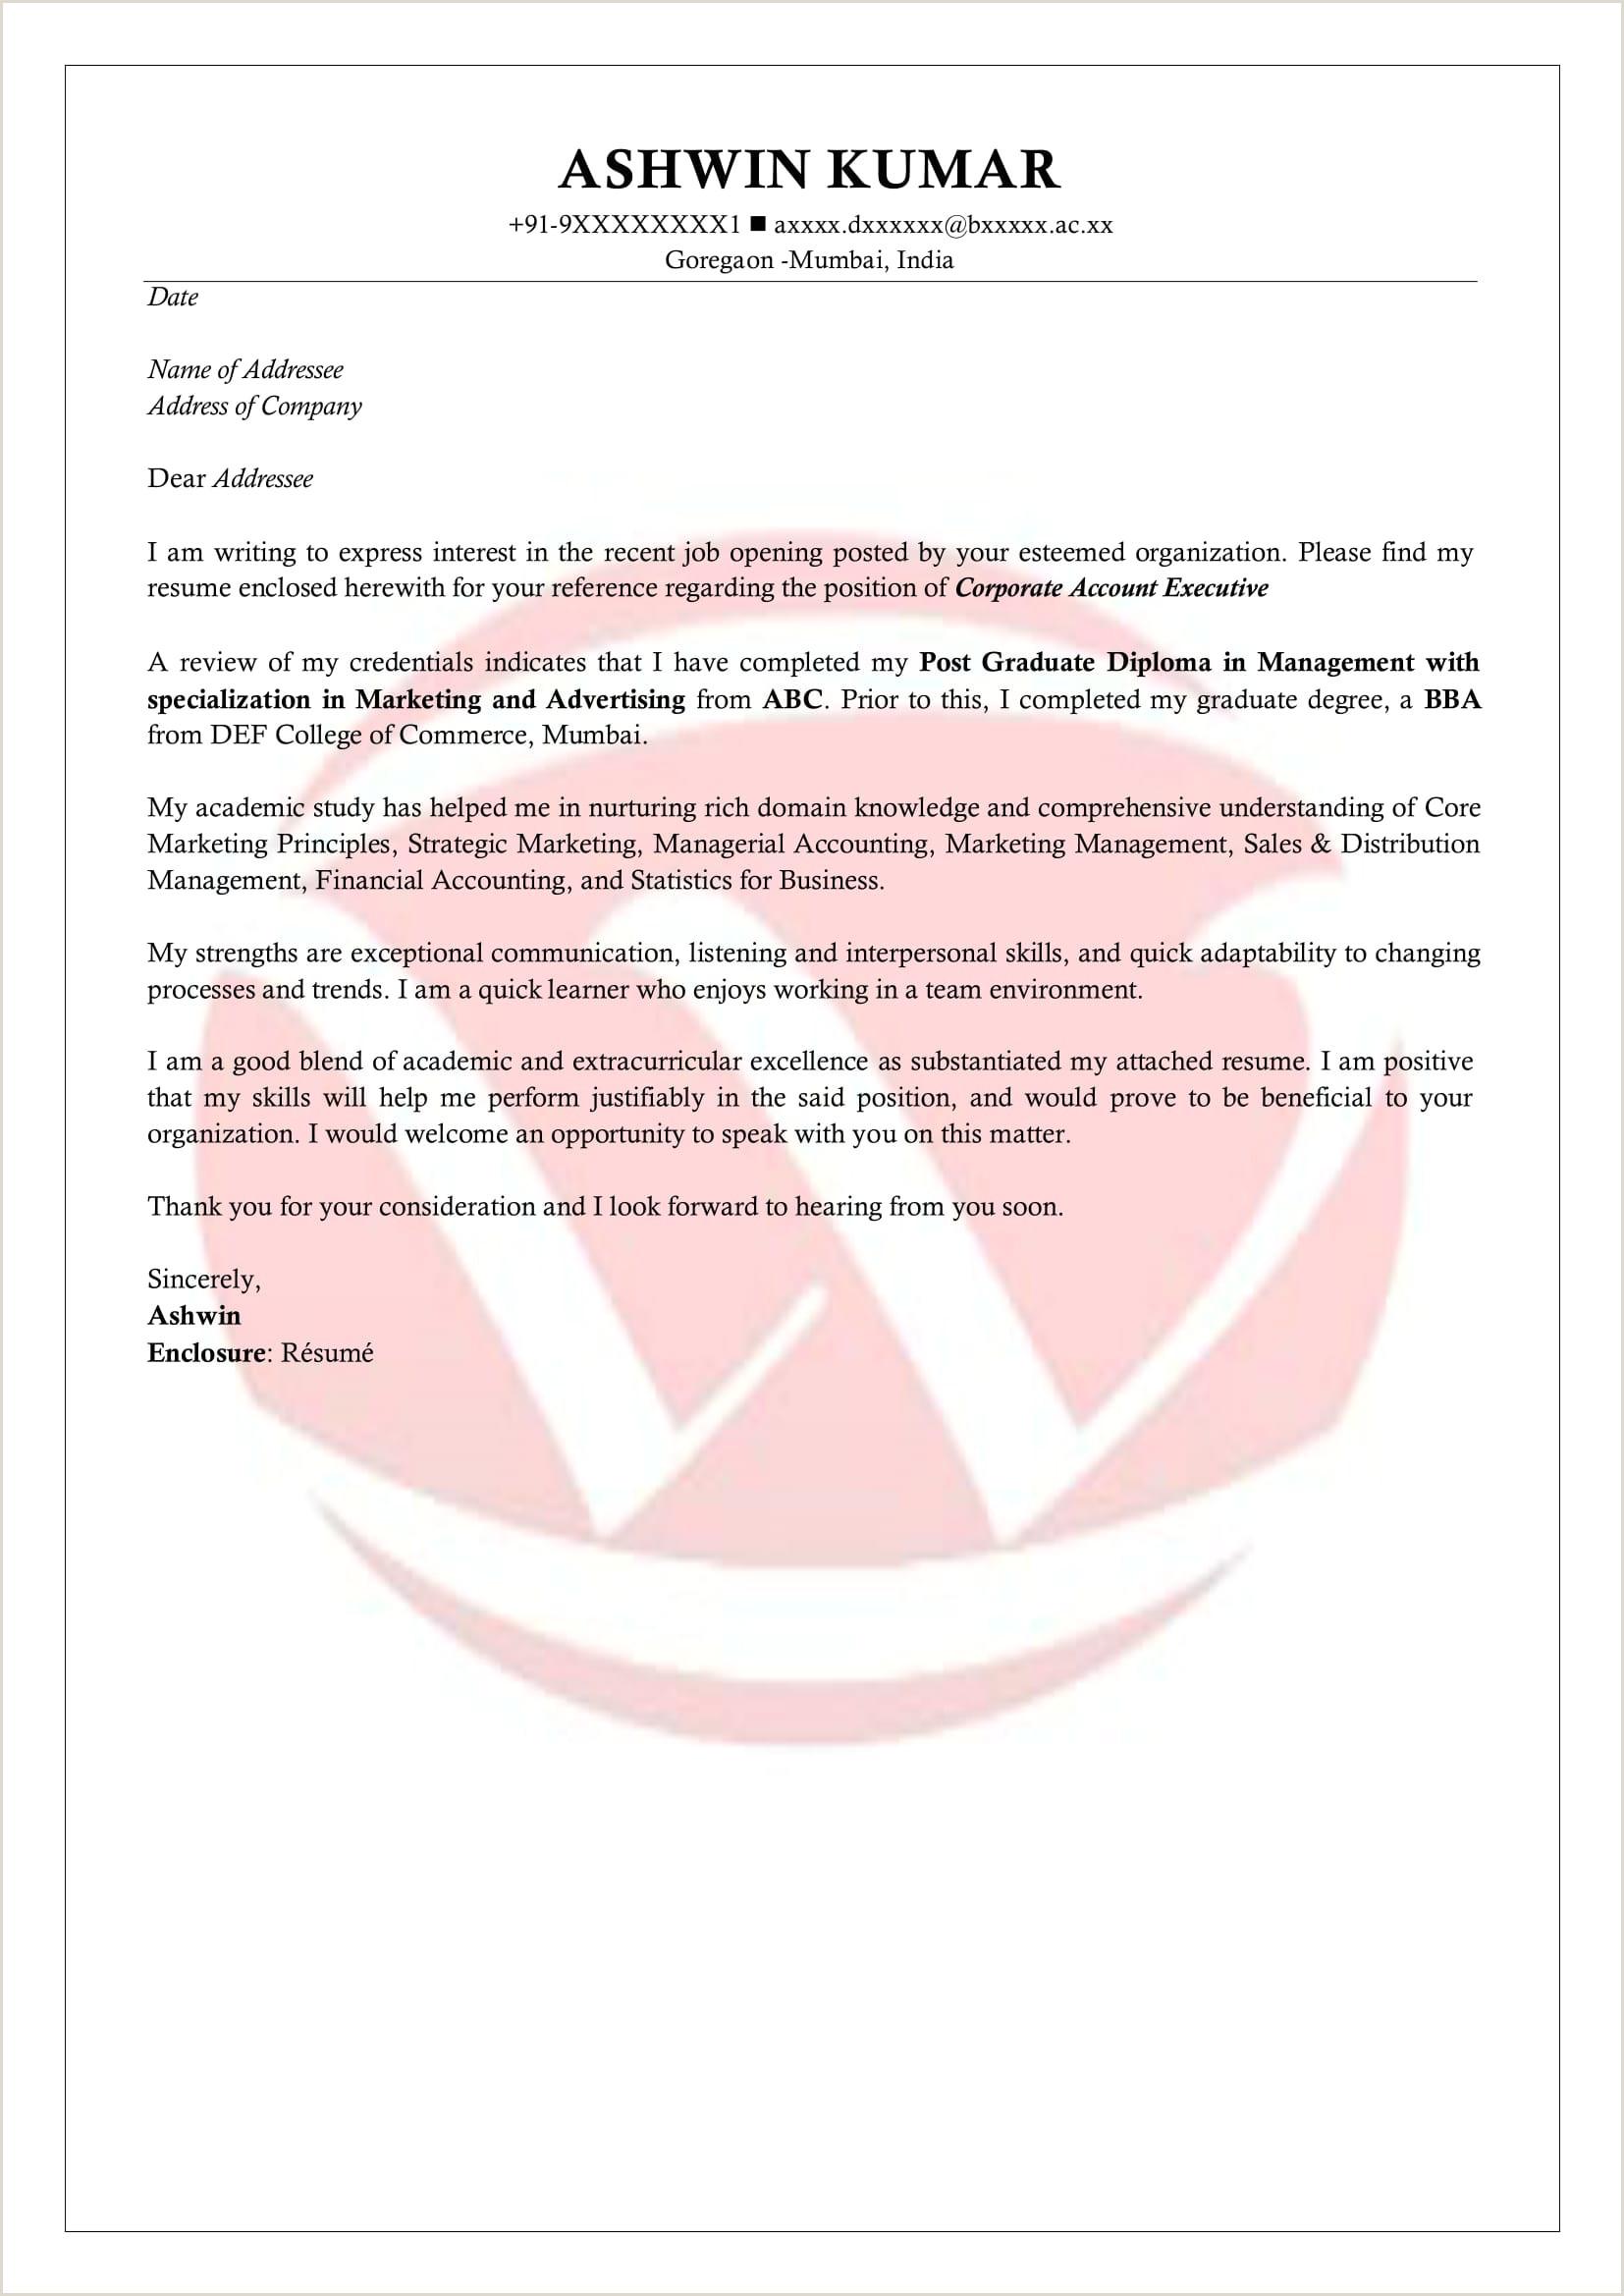 Fresher Resume Format For B.tech Cse Freshers Sample Cover Letter Format Download Cover Letter